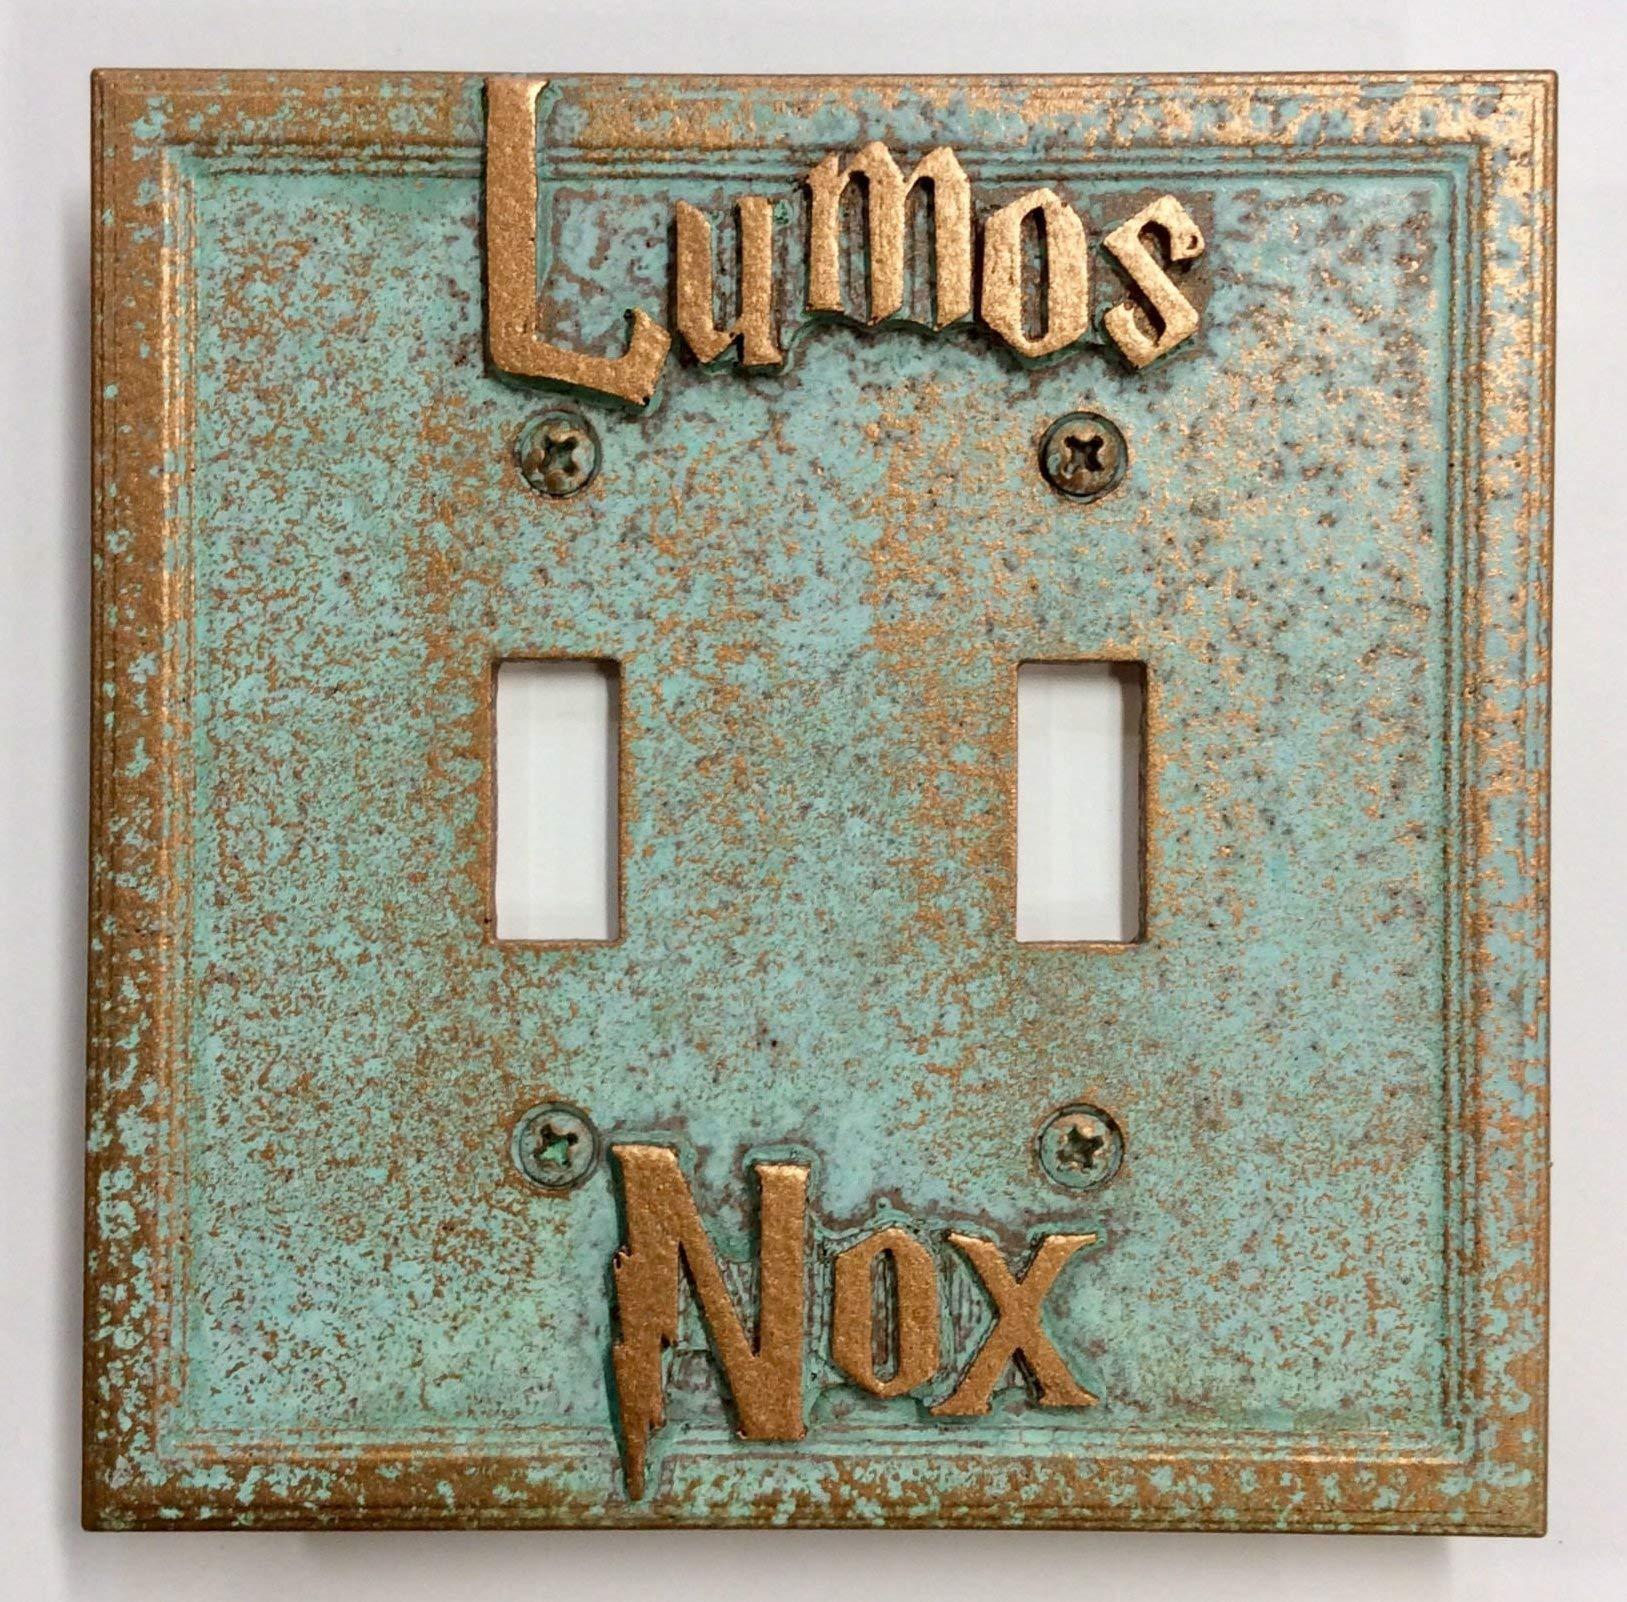 Lumos/Nox Double Light Switch Cover (Patina)